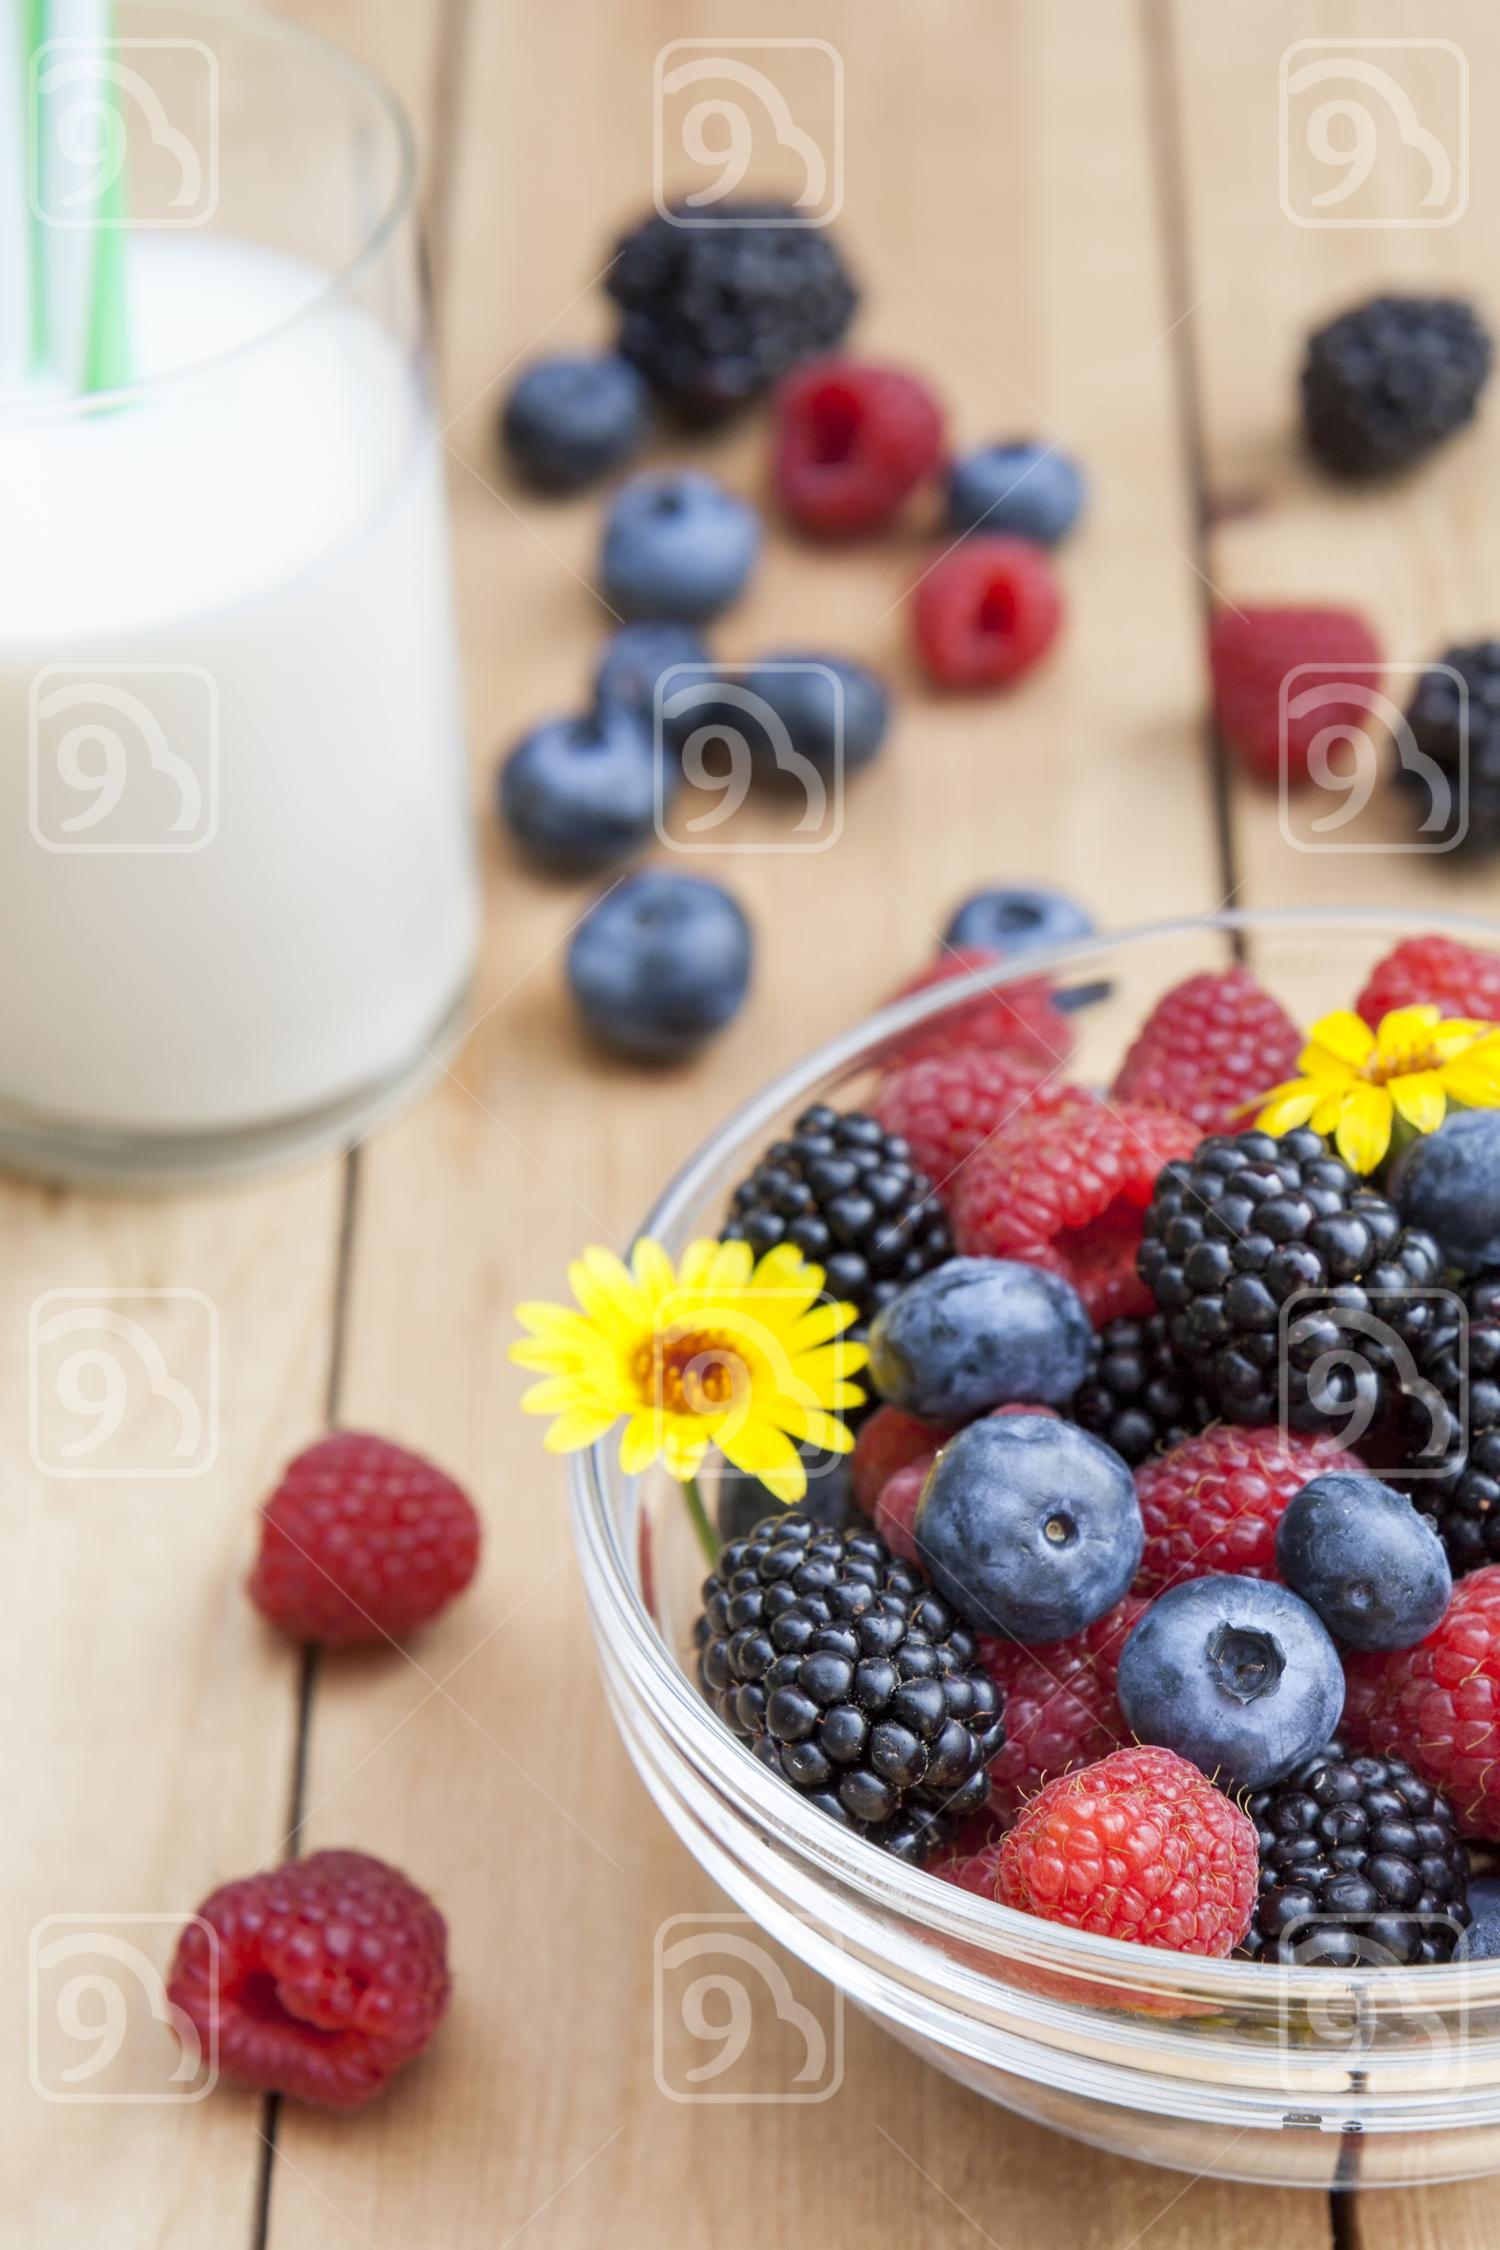 Glass bowl of fresh blackberries, raspberries, blueberries